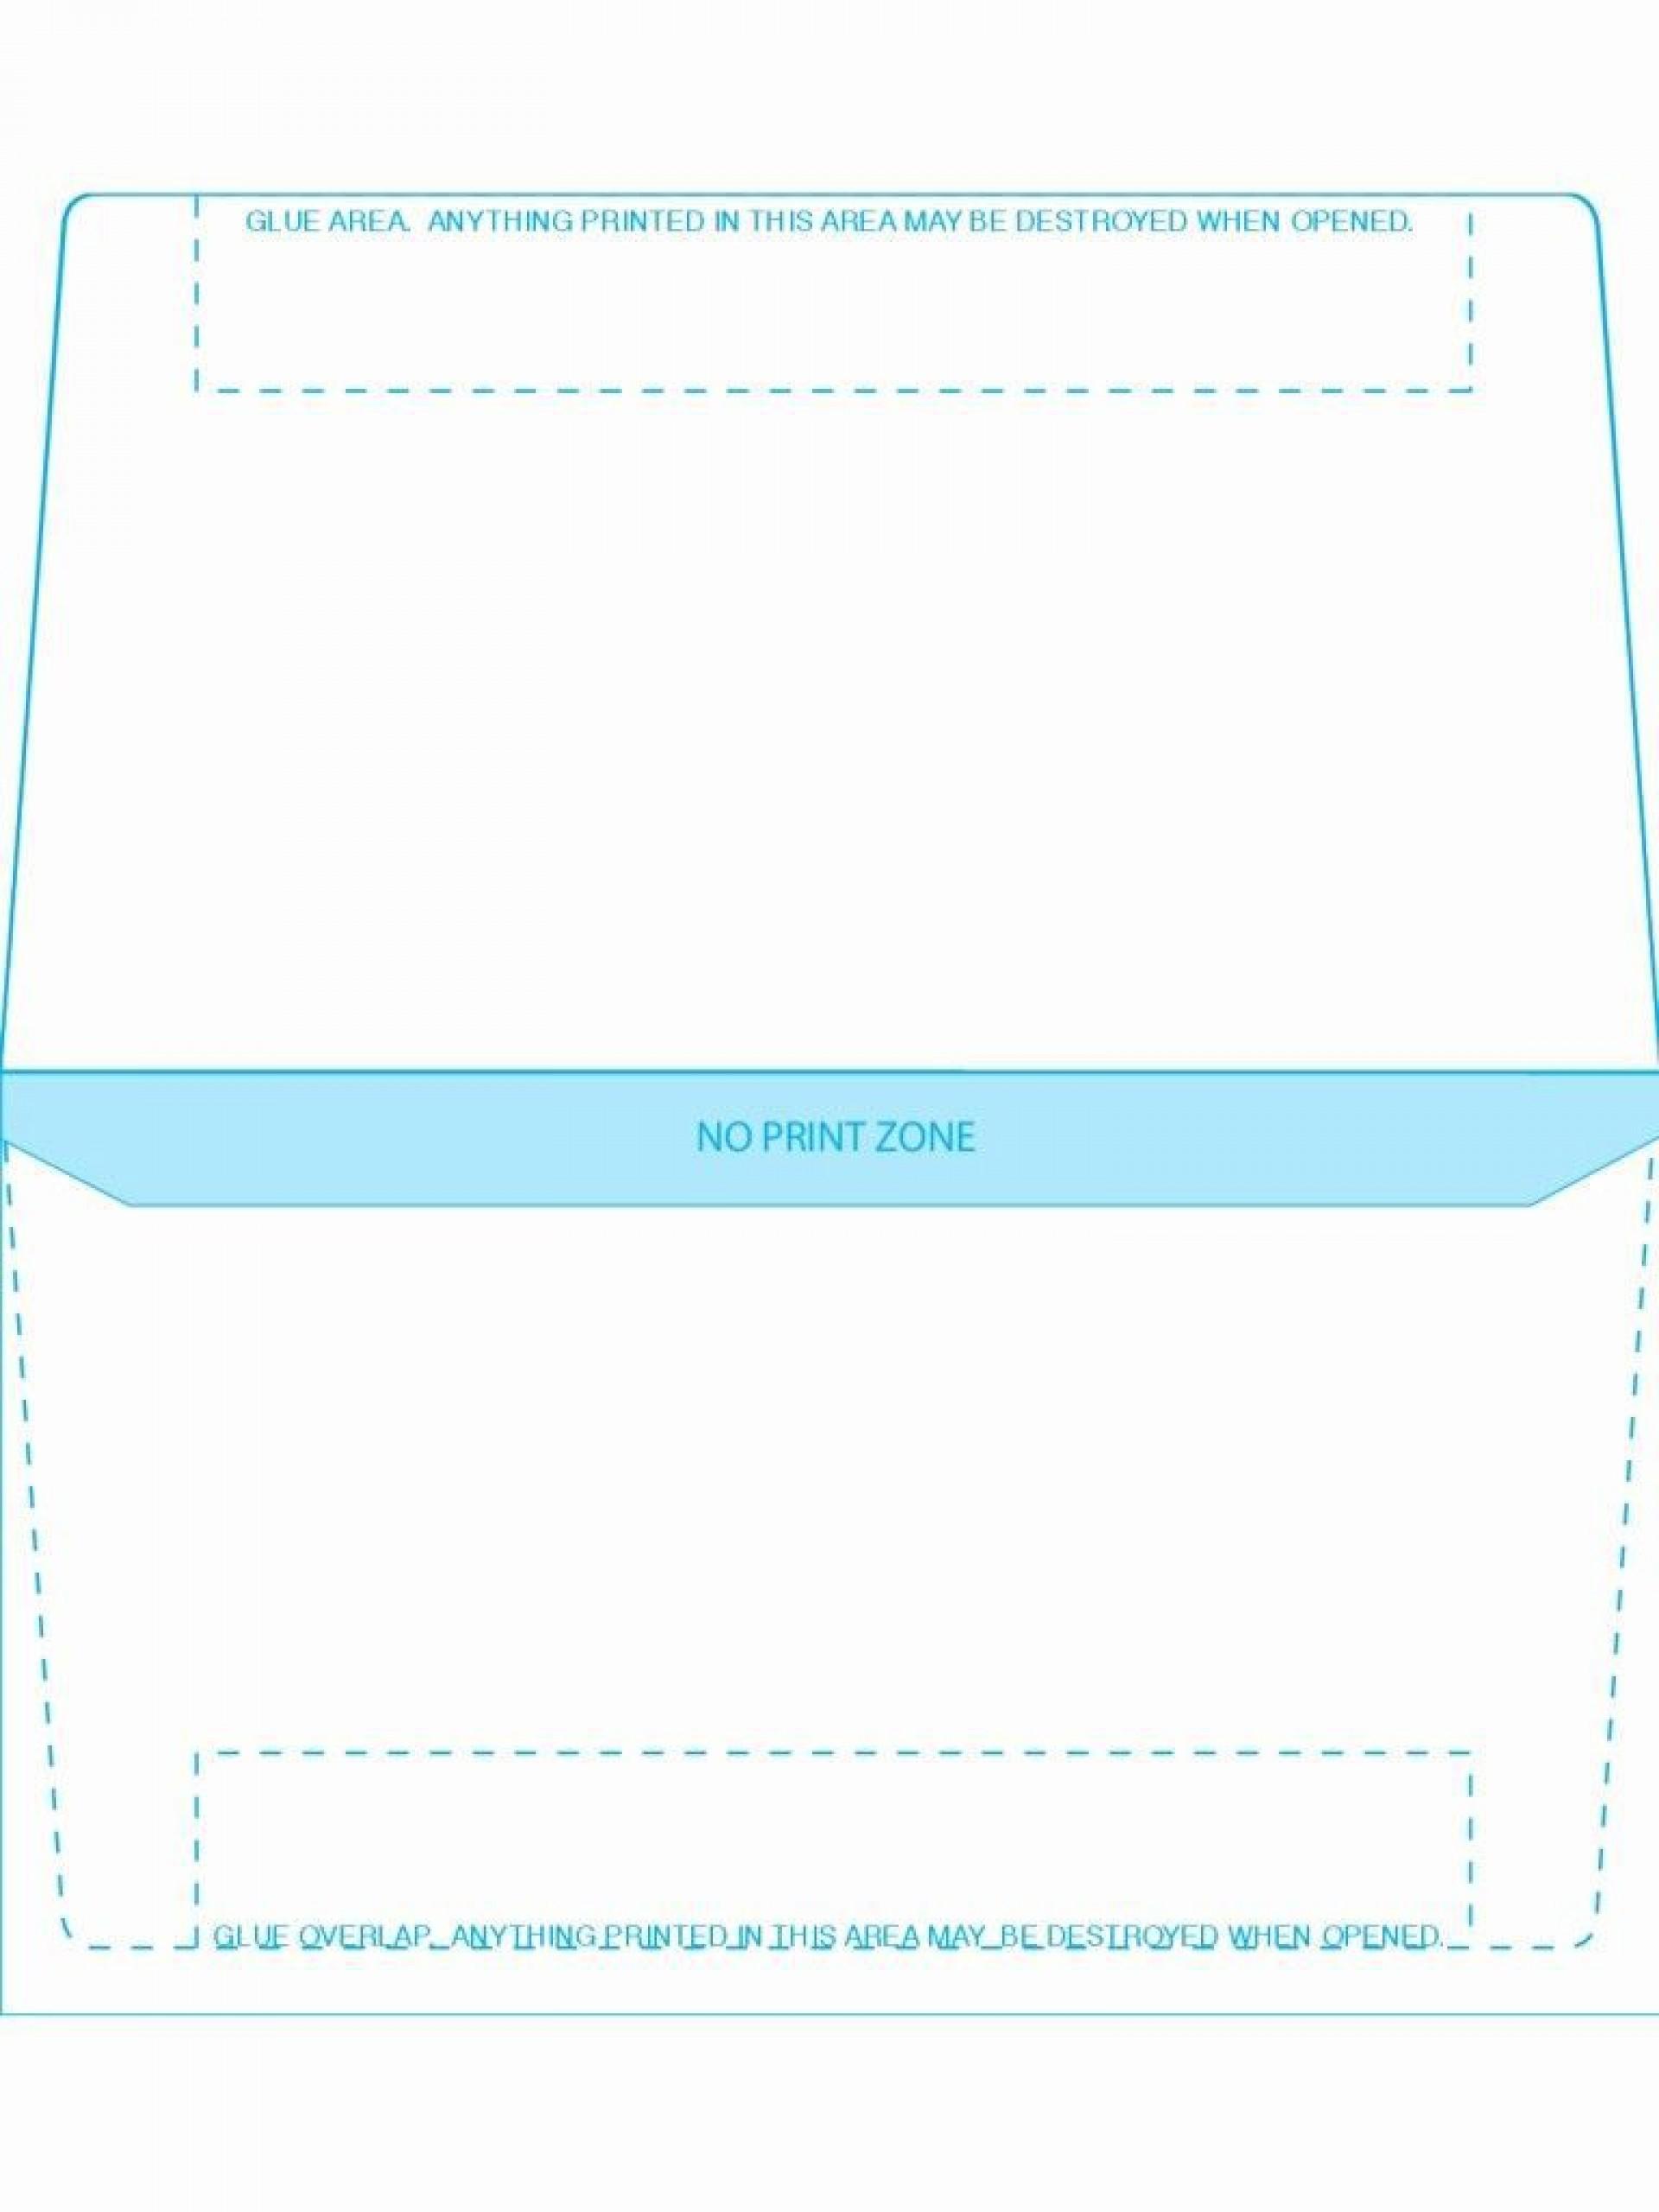 003 Fantastic 10 Envelope Template Word Design  Size Microsoft #10 Double Window1920